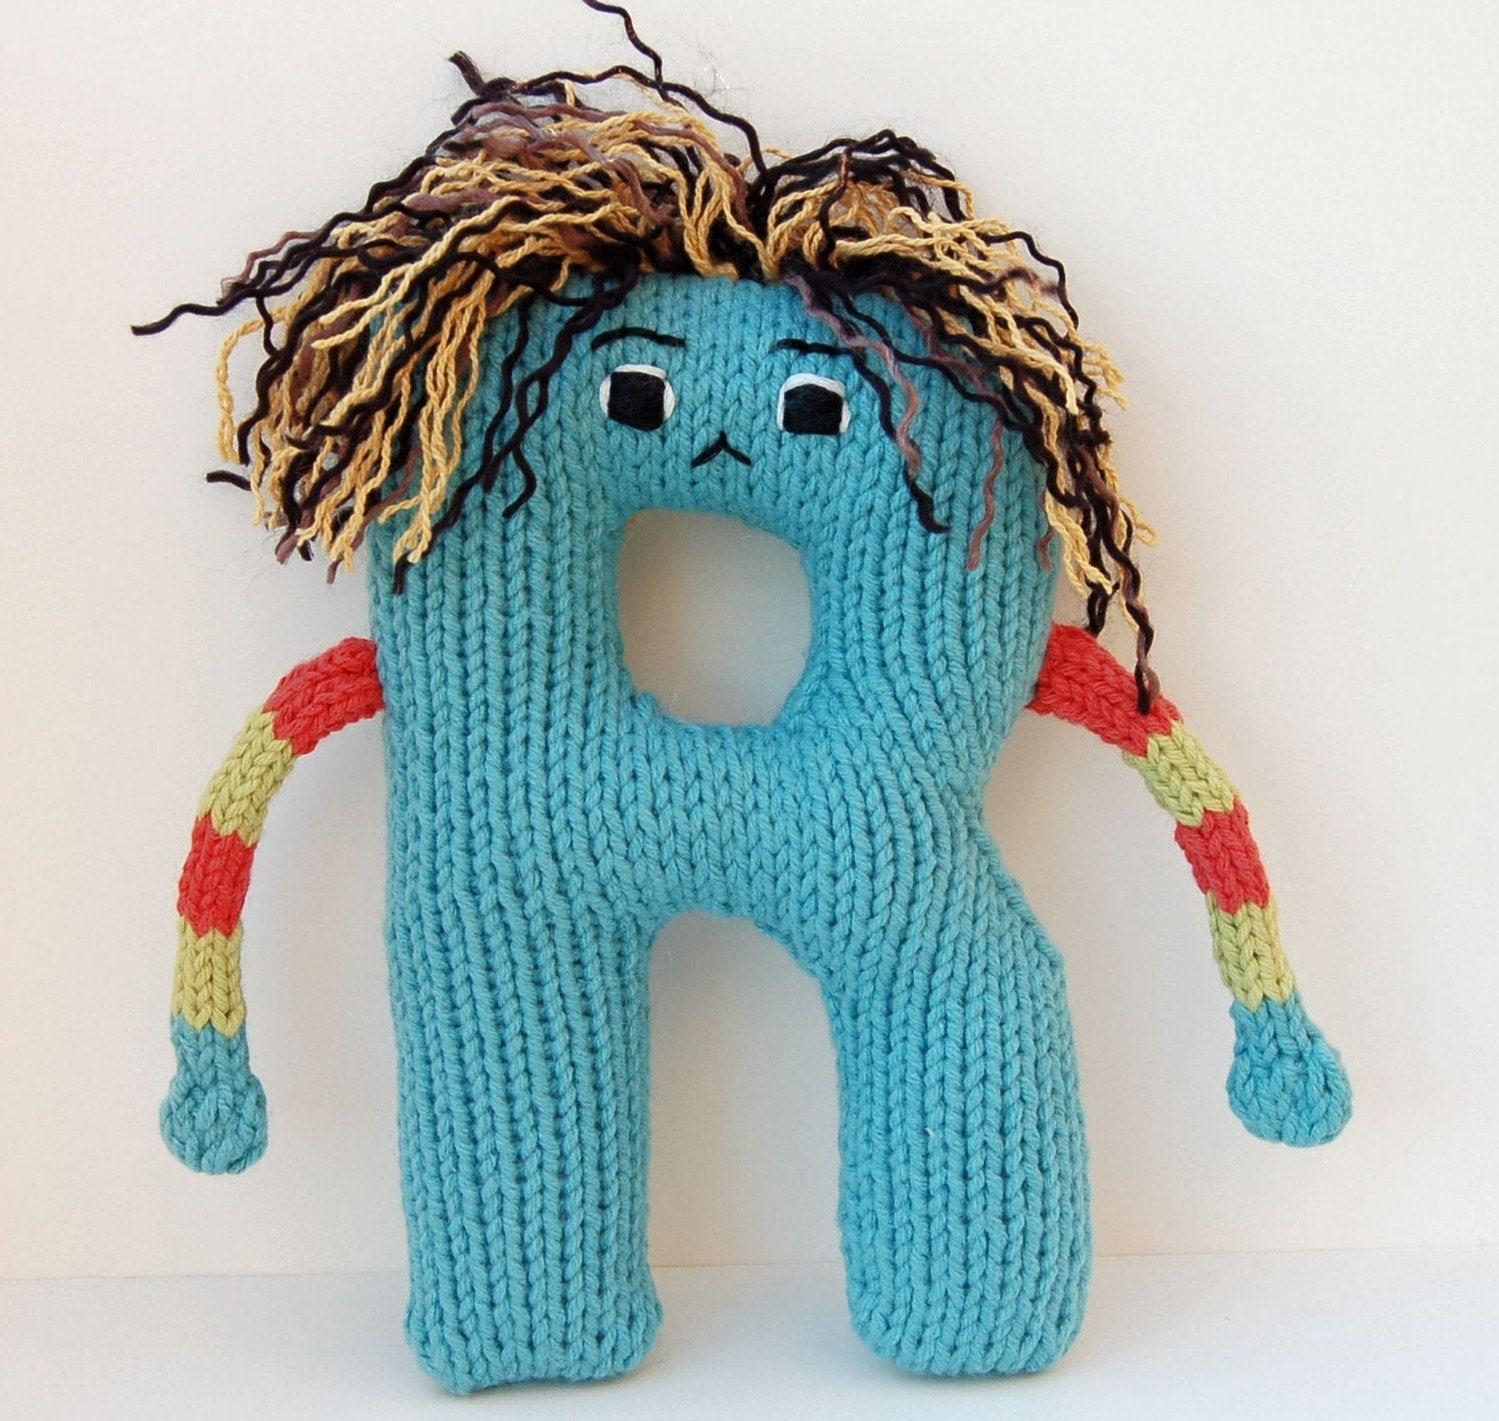 Letter R - Alphabet Stuffed Toy Knitting PATTERN - Rodney